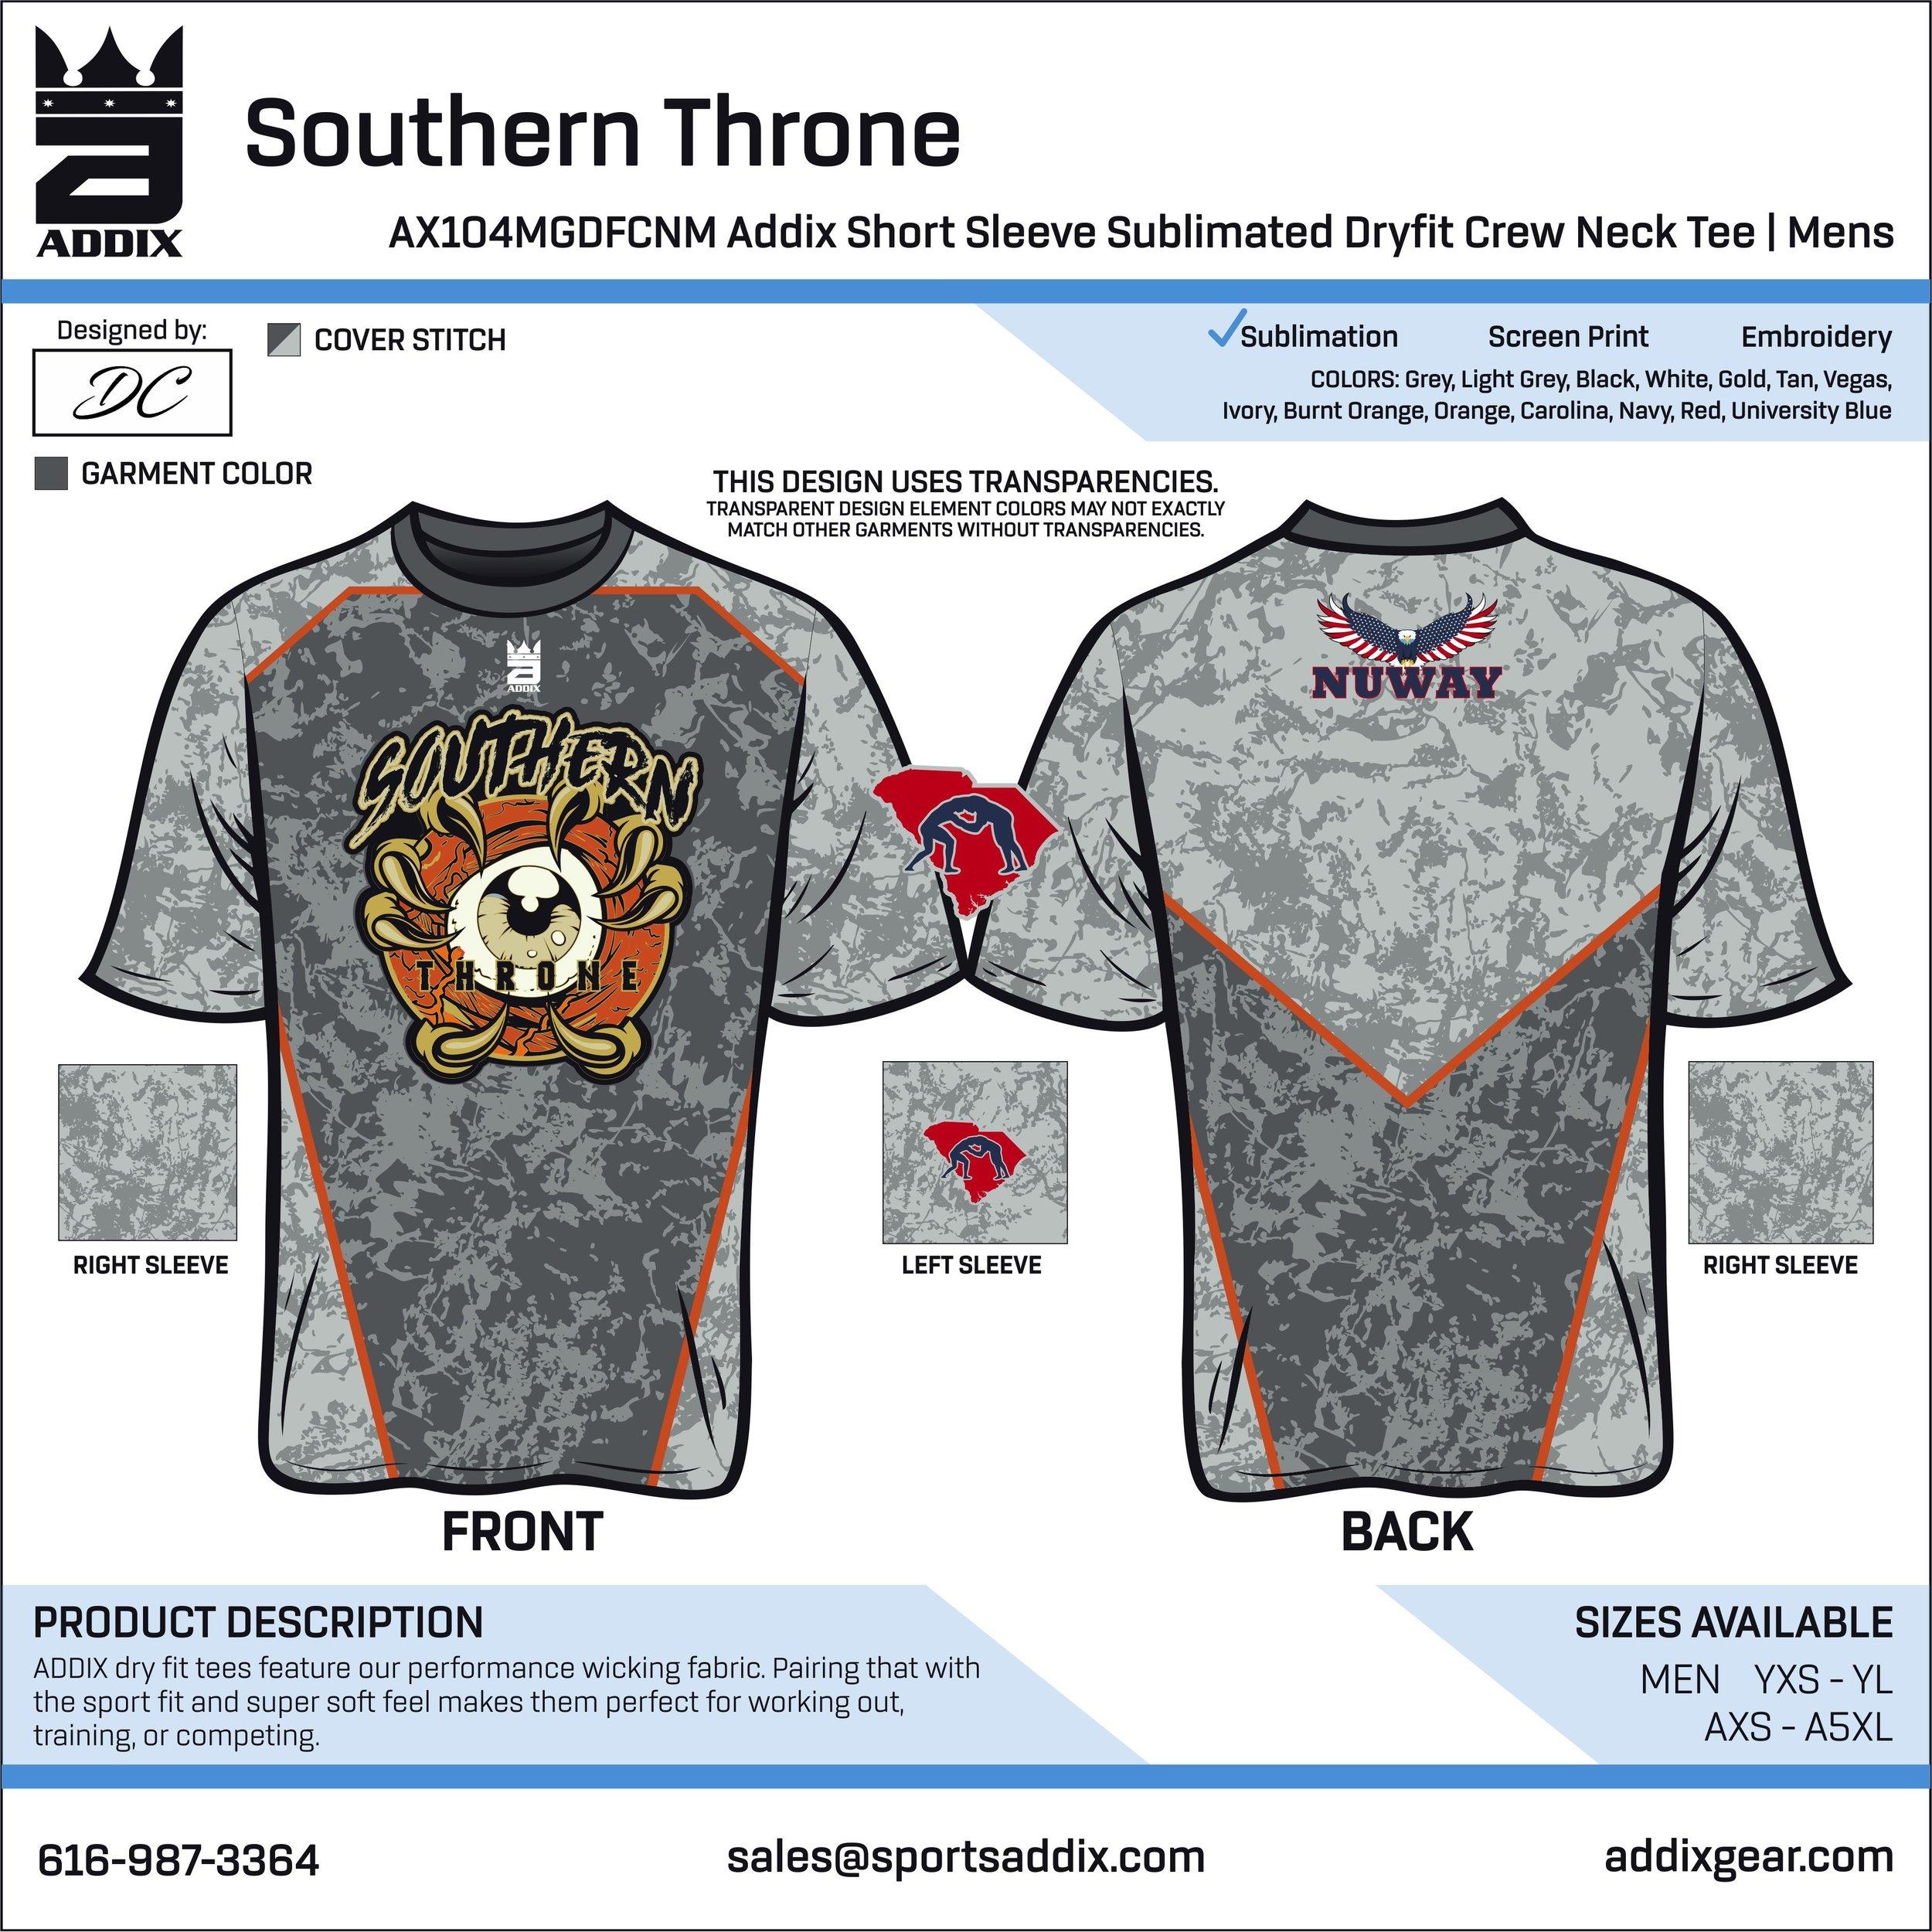 Southern Throne_2018_12-20_DC_SS DF Tee v2.jpg